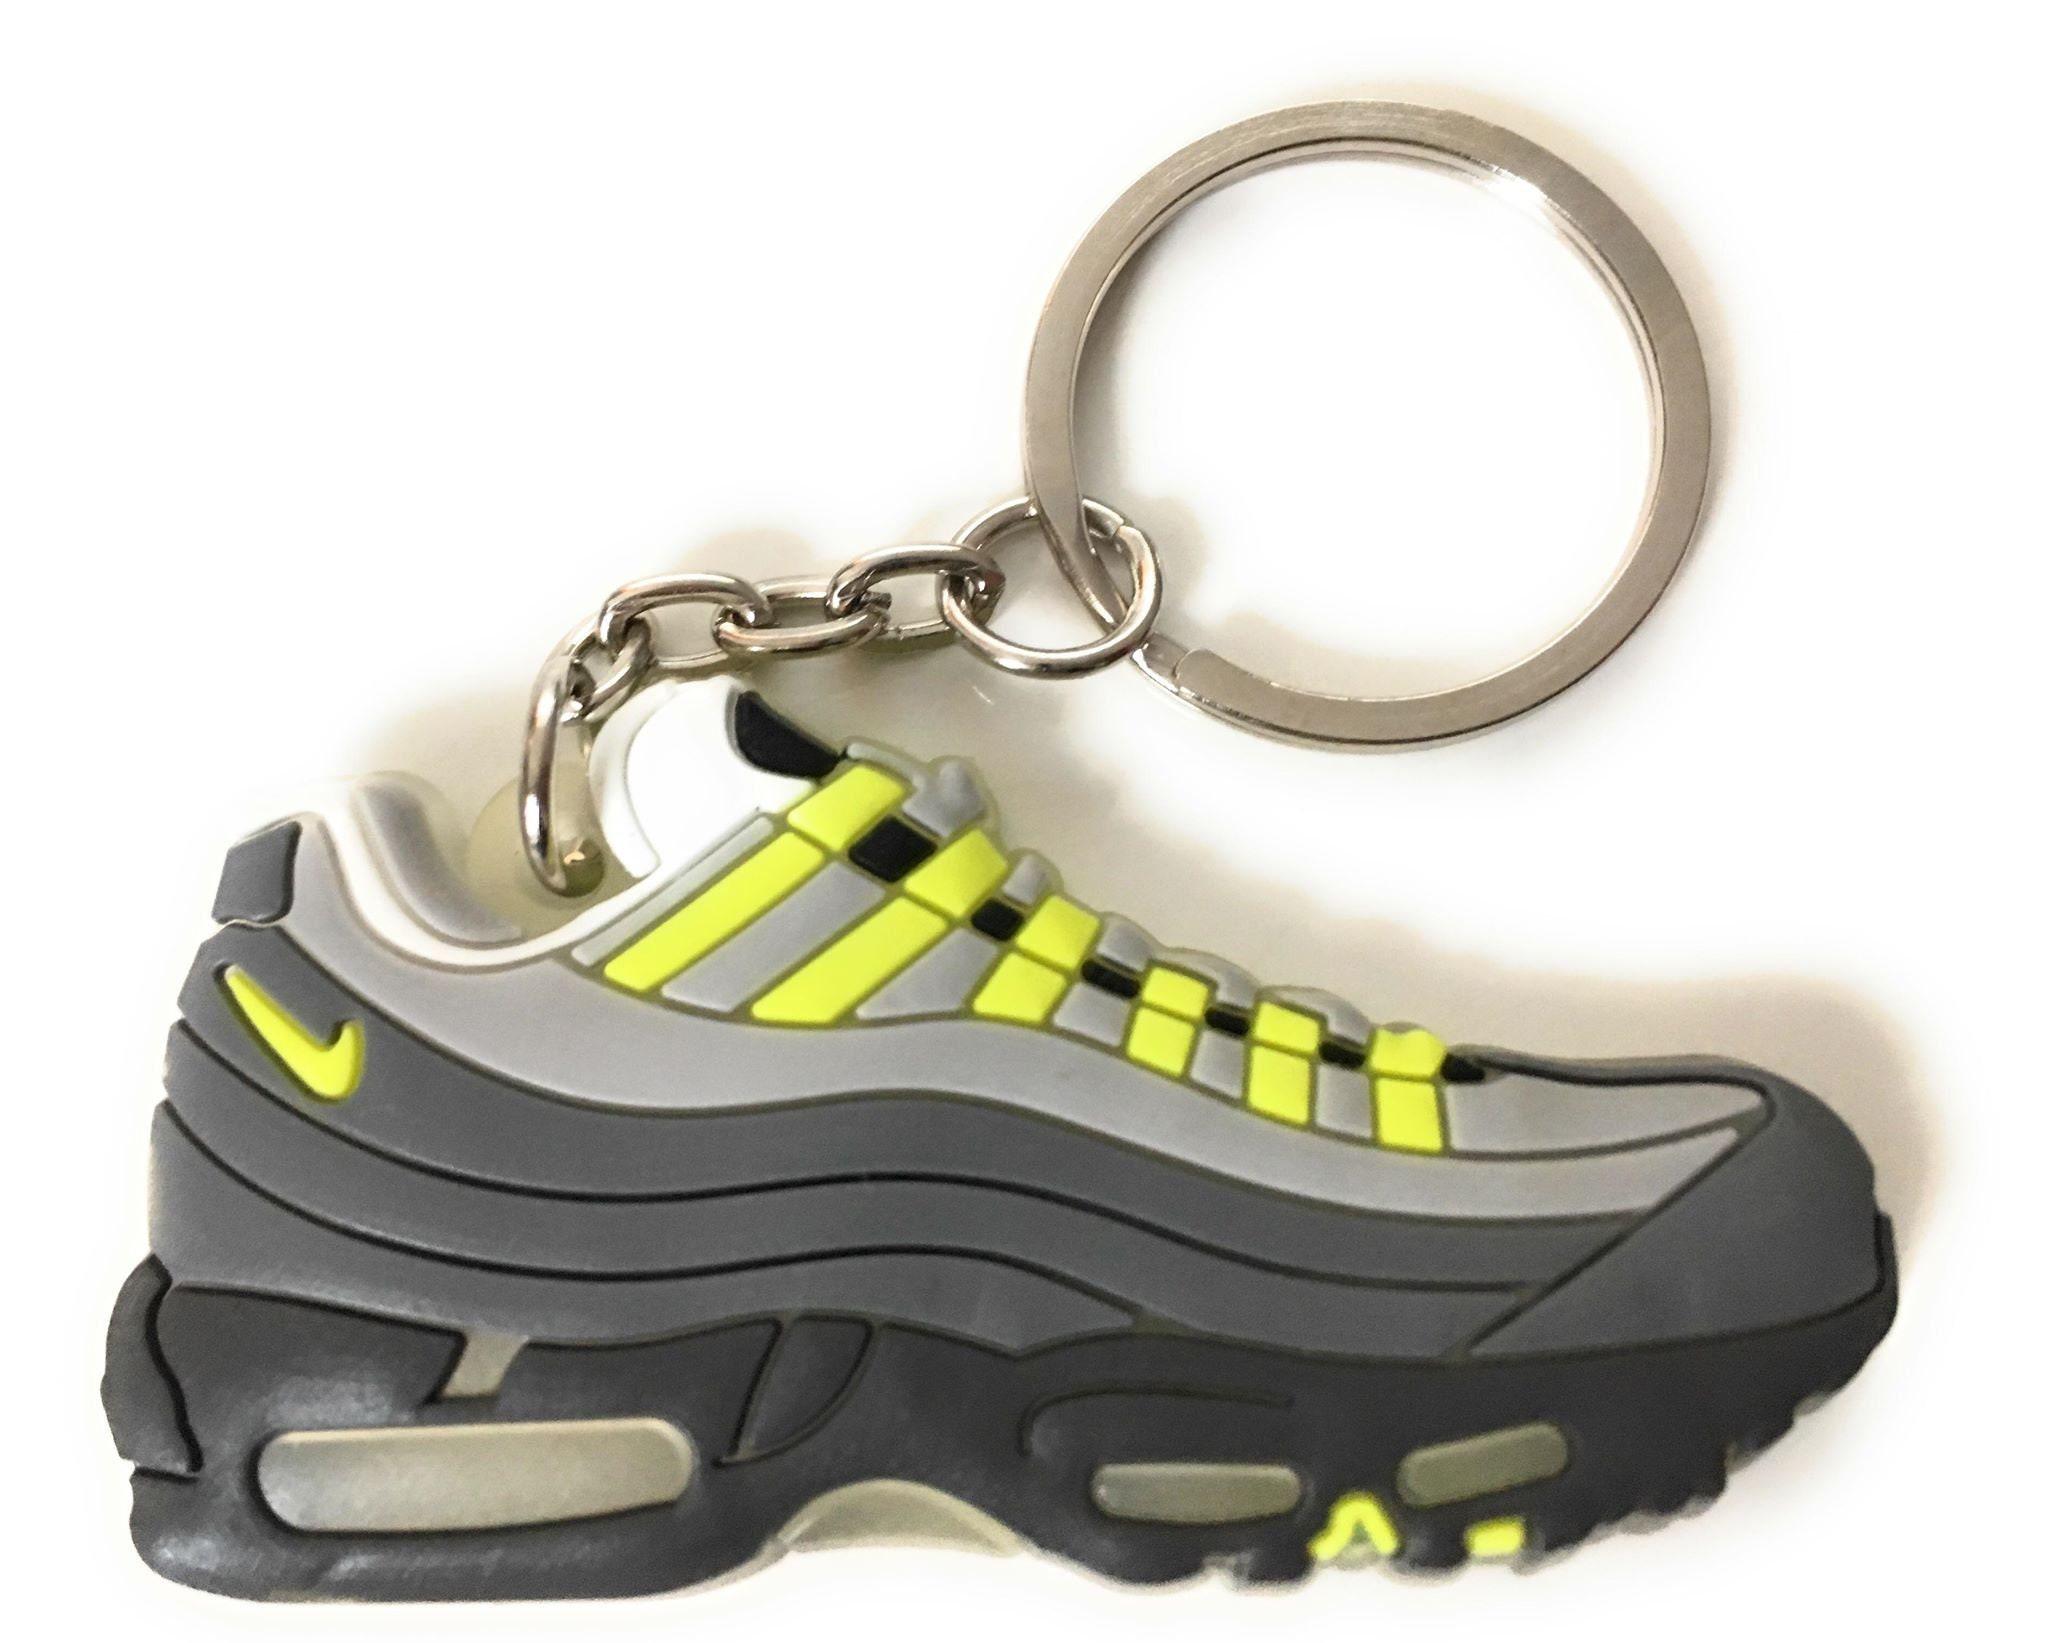 new style 1233f 99168 Nike Air Max 95 OG Keychain Neon keychain   Etsy